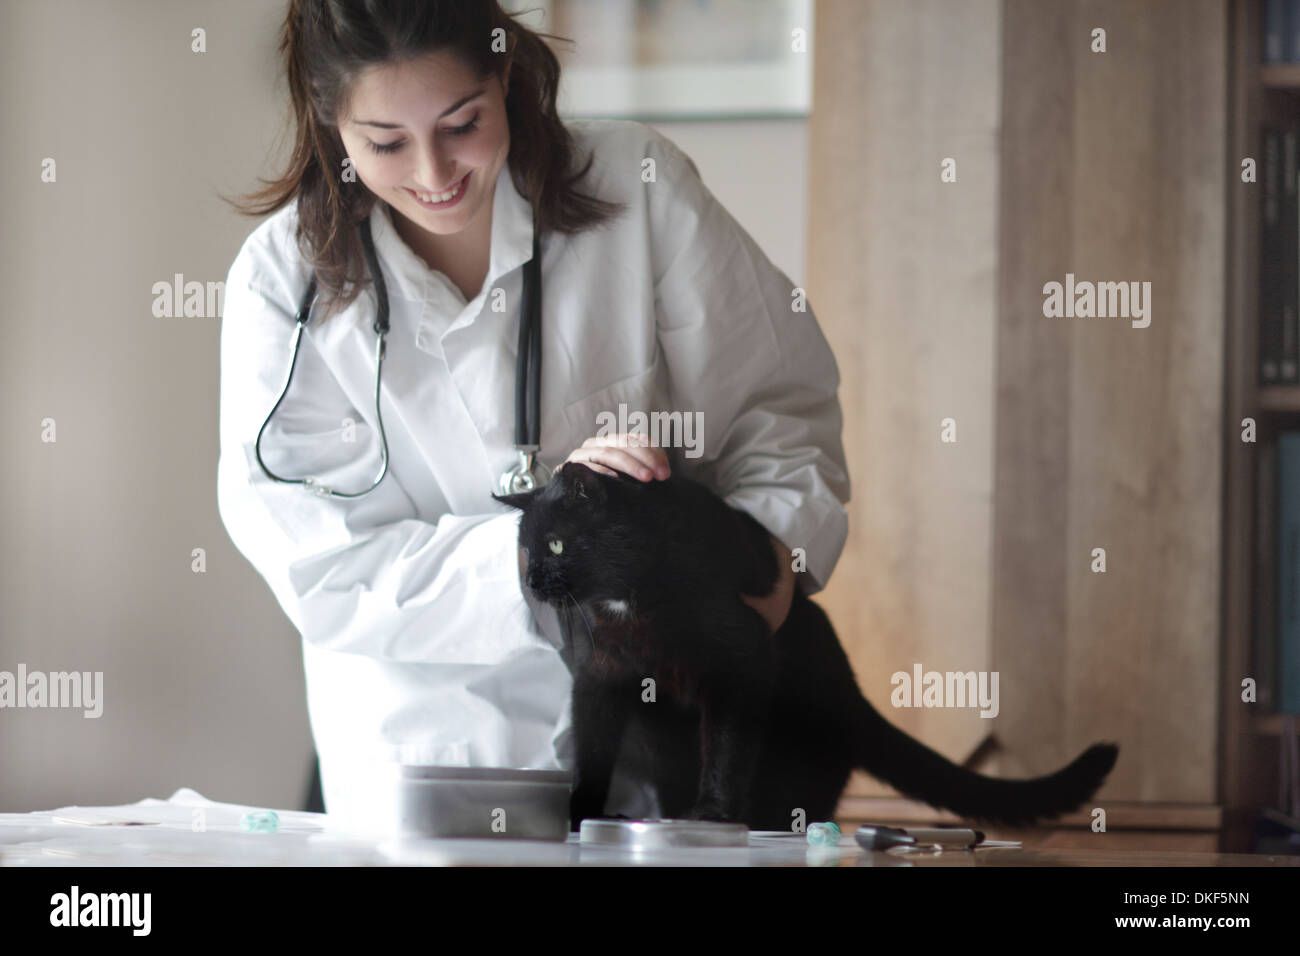 Veterinarian examining black cat - Stock Image